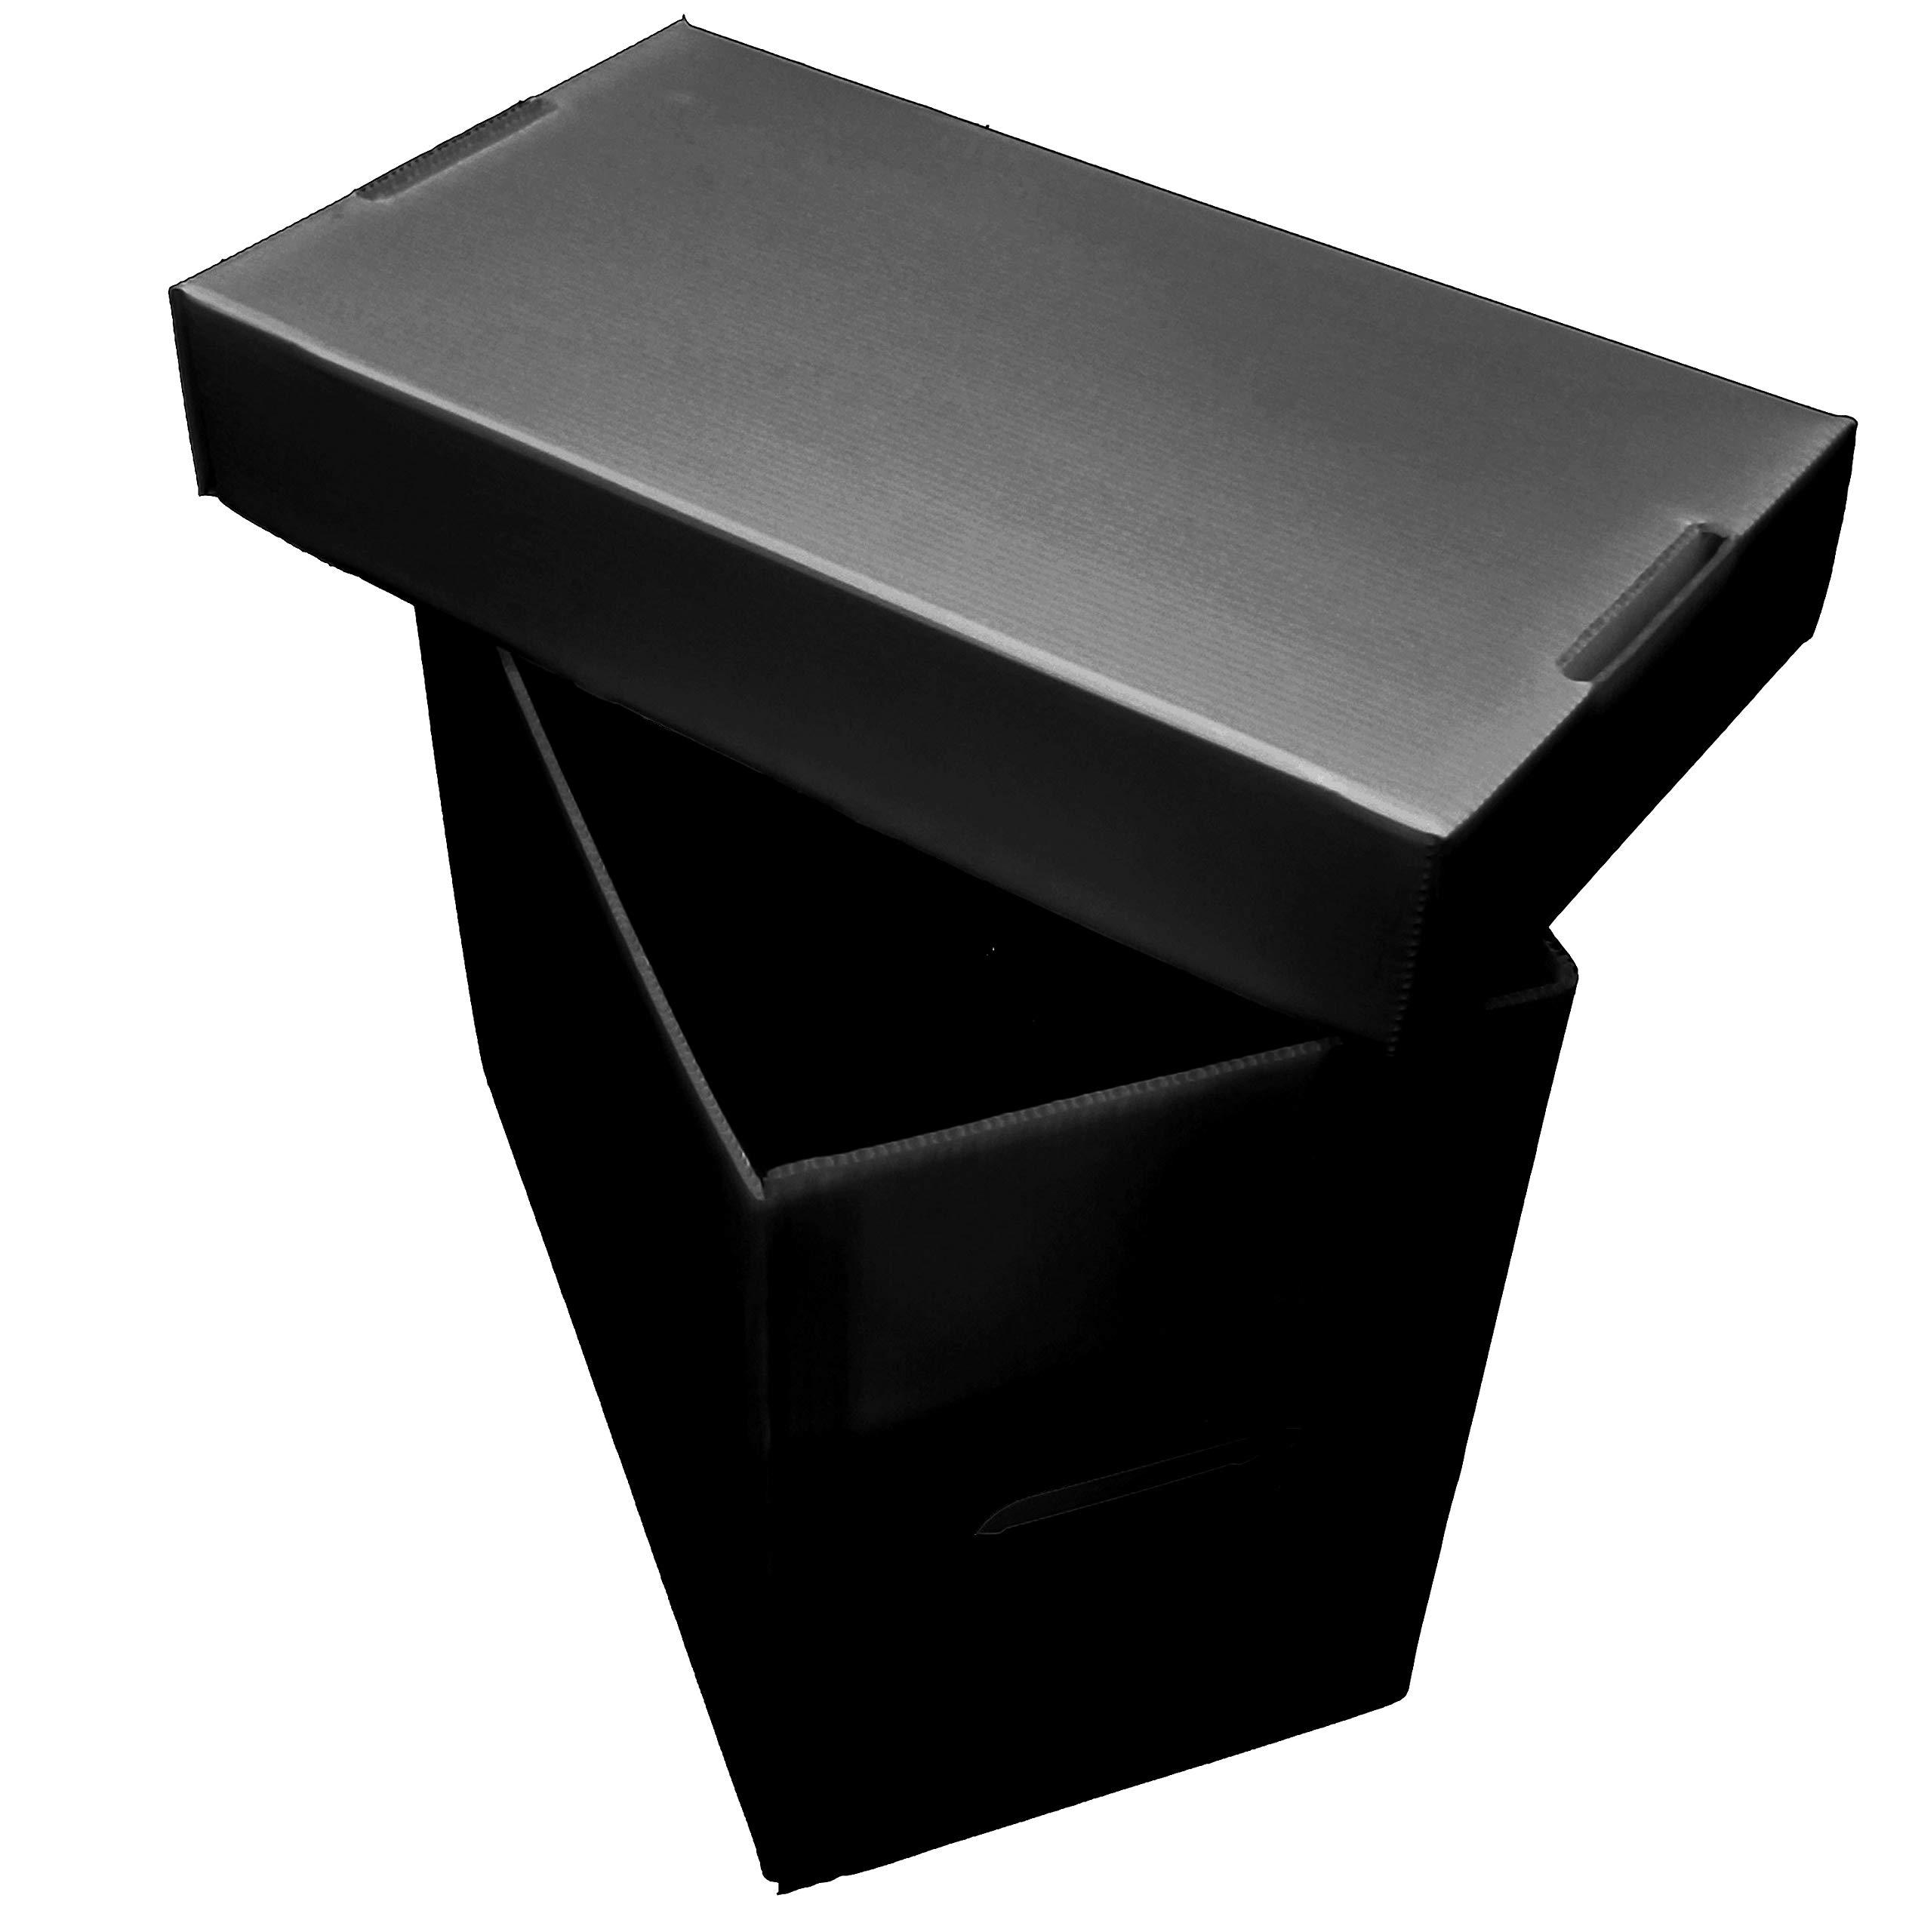 Premium Plastic Graded CGX Comic Storage Box - Black - Holds 35-40 Comics - Archival Safe (10)